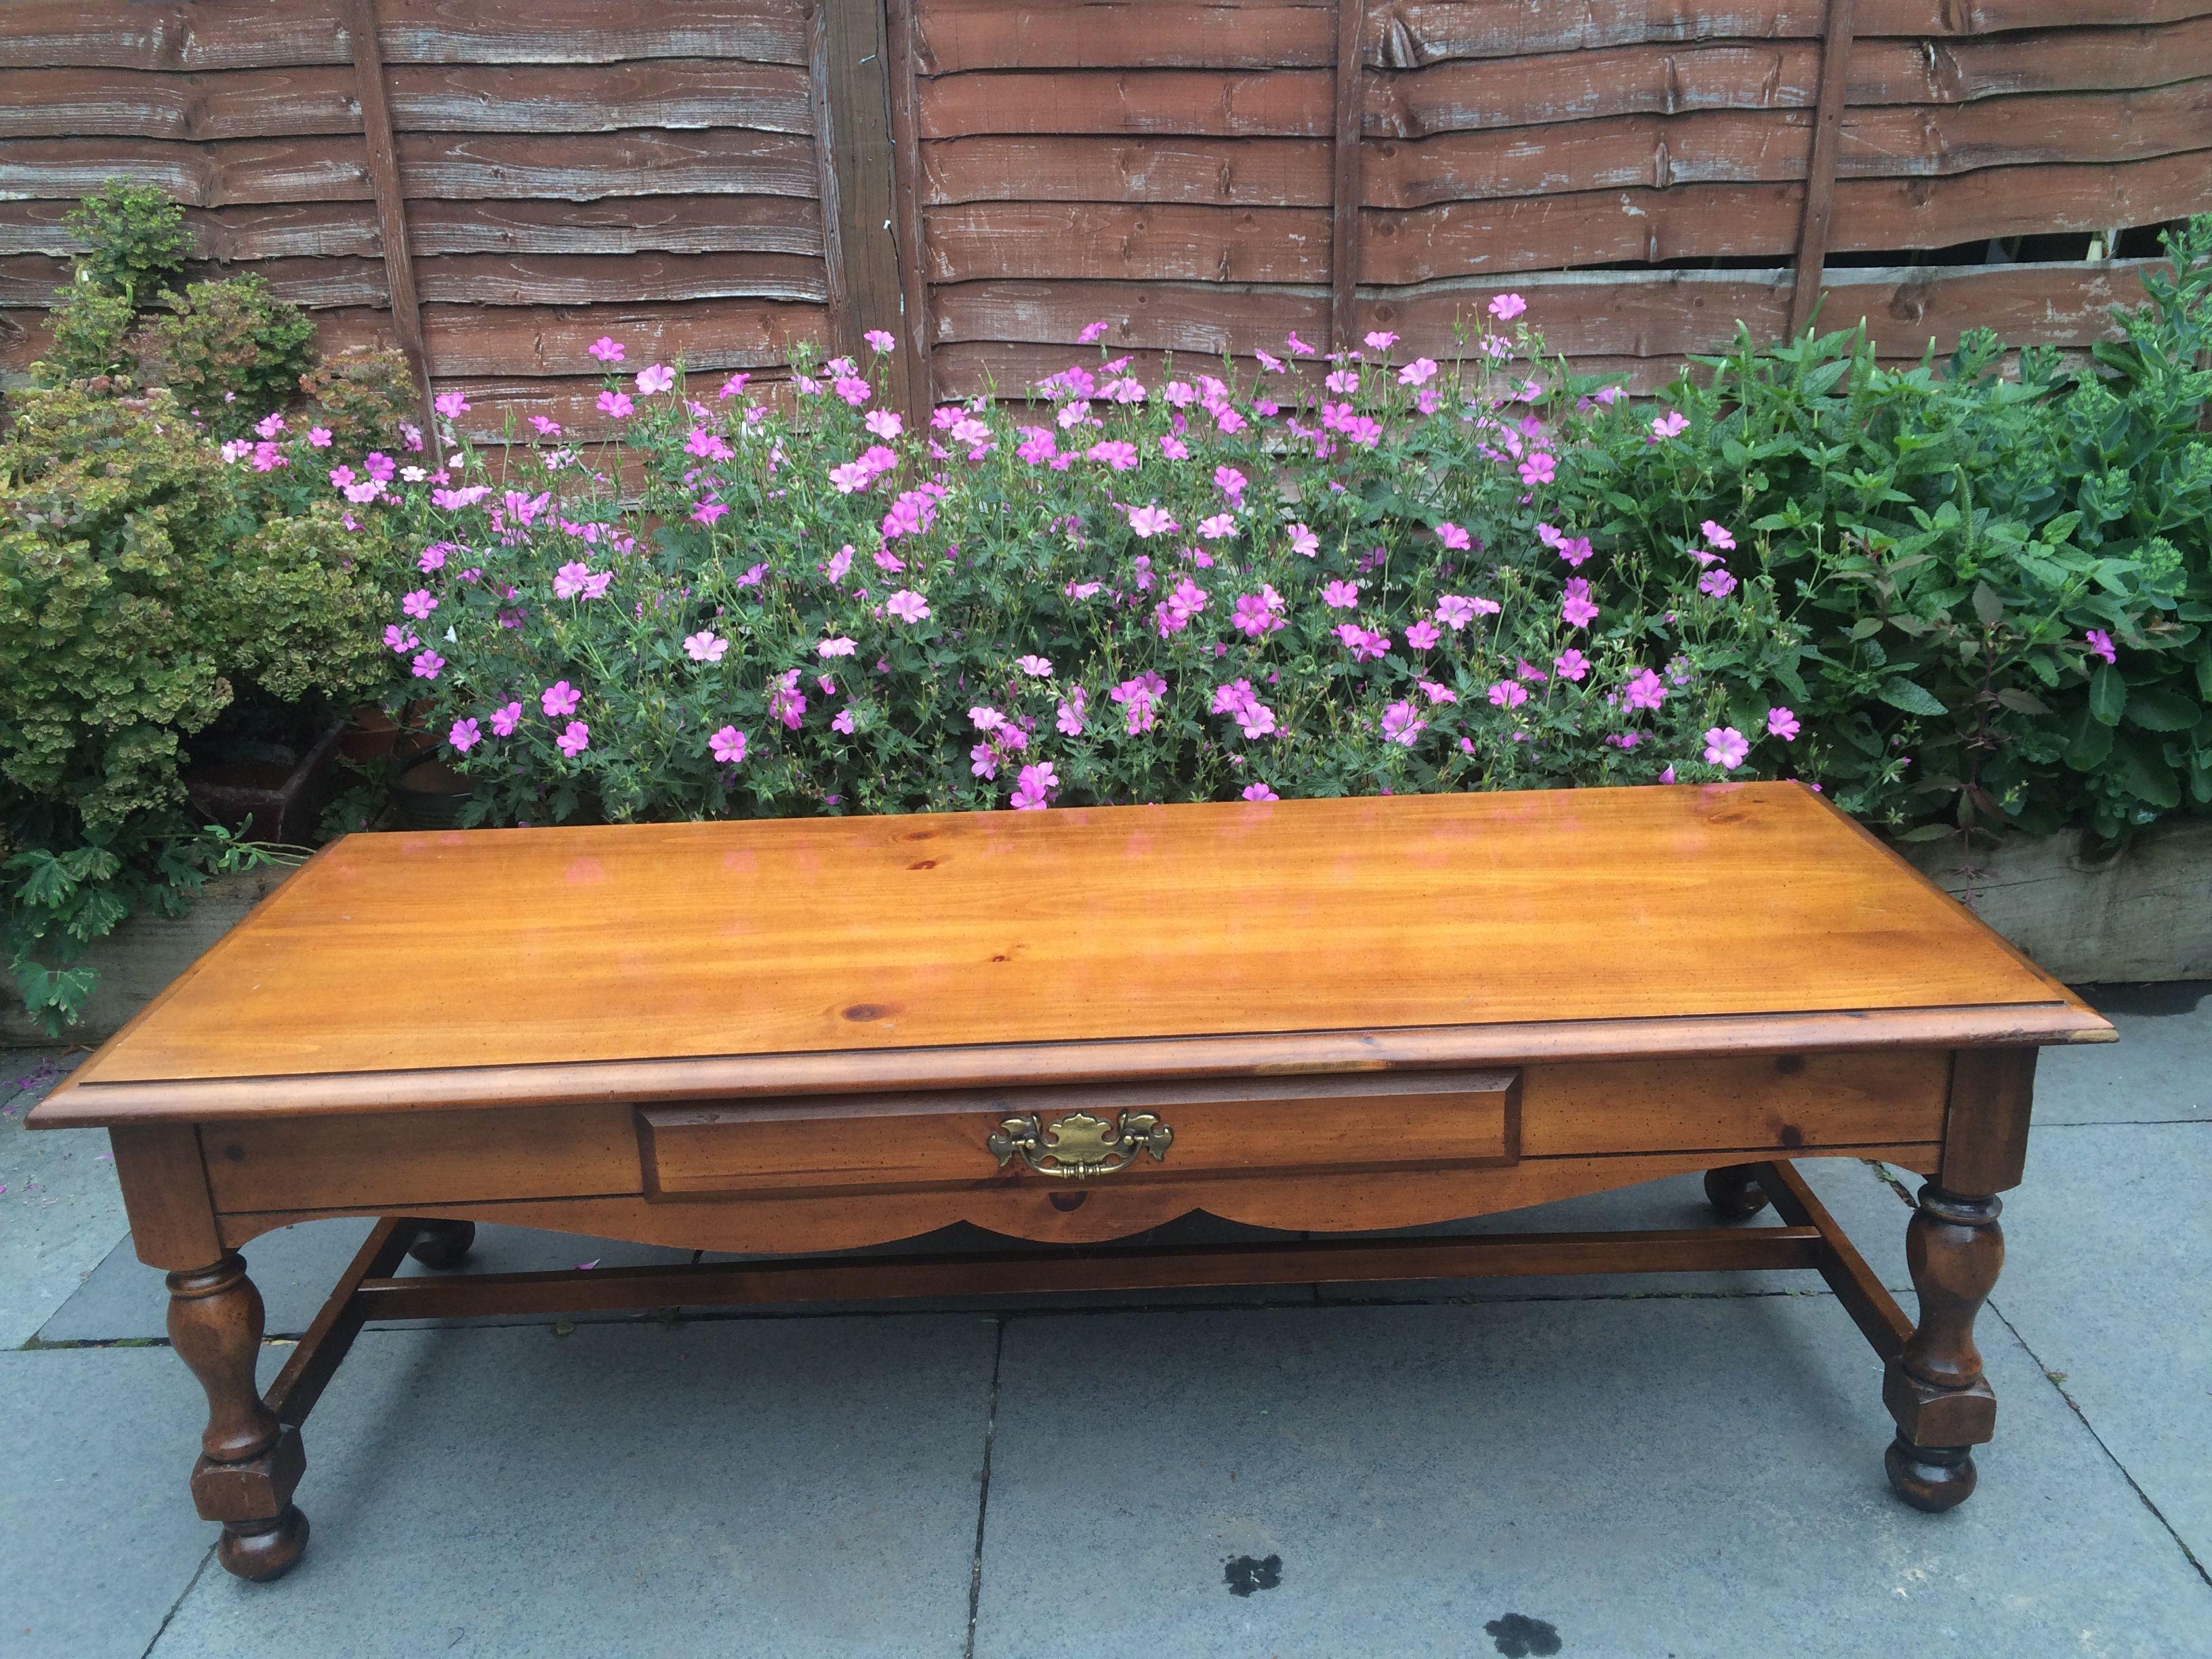 Bassett Genuine Furniture 1960s solid wood coffee table